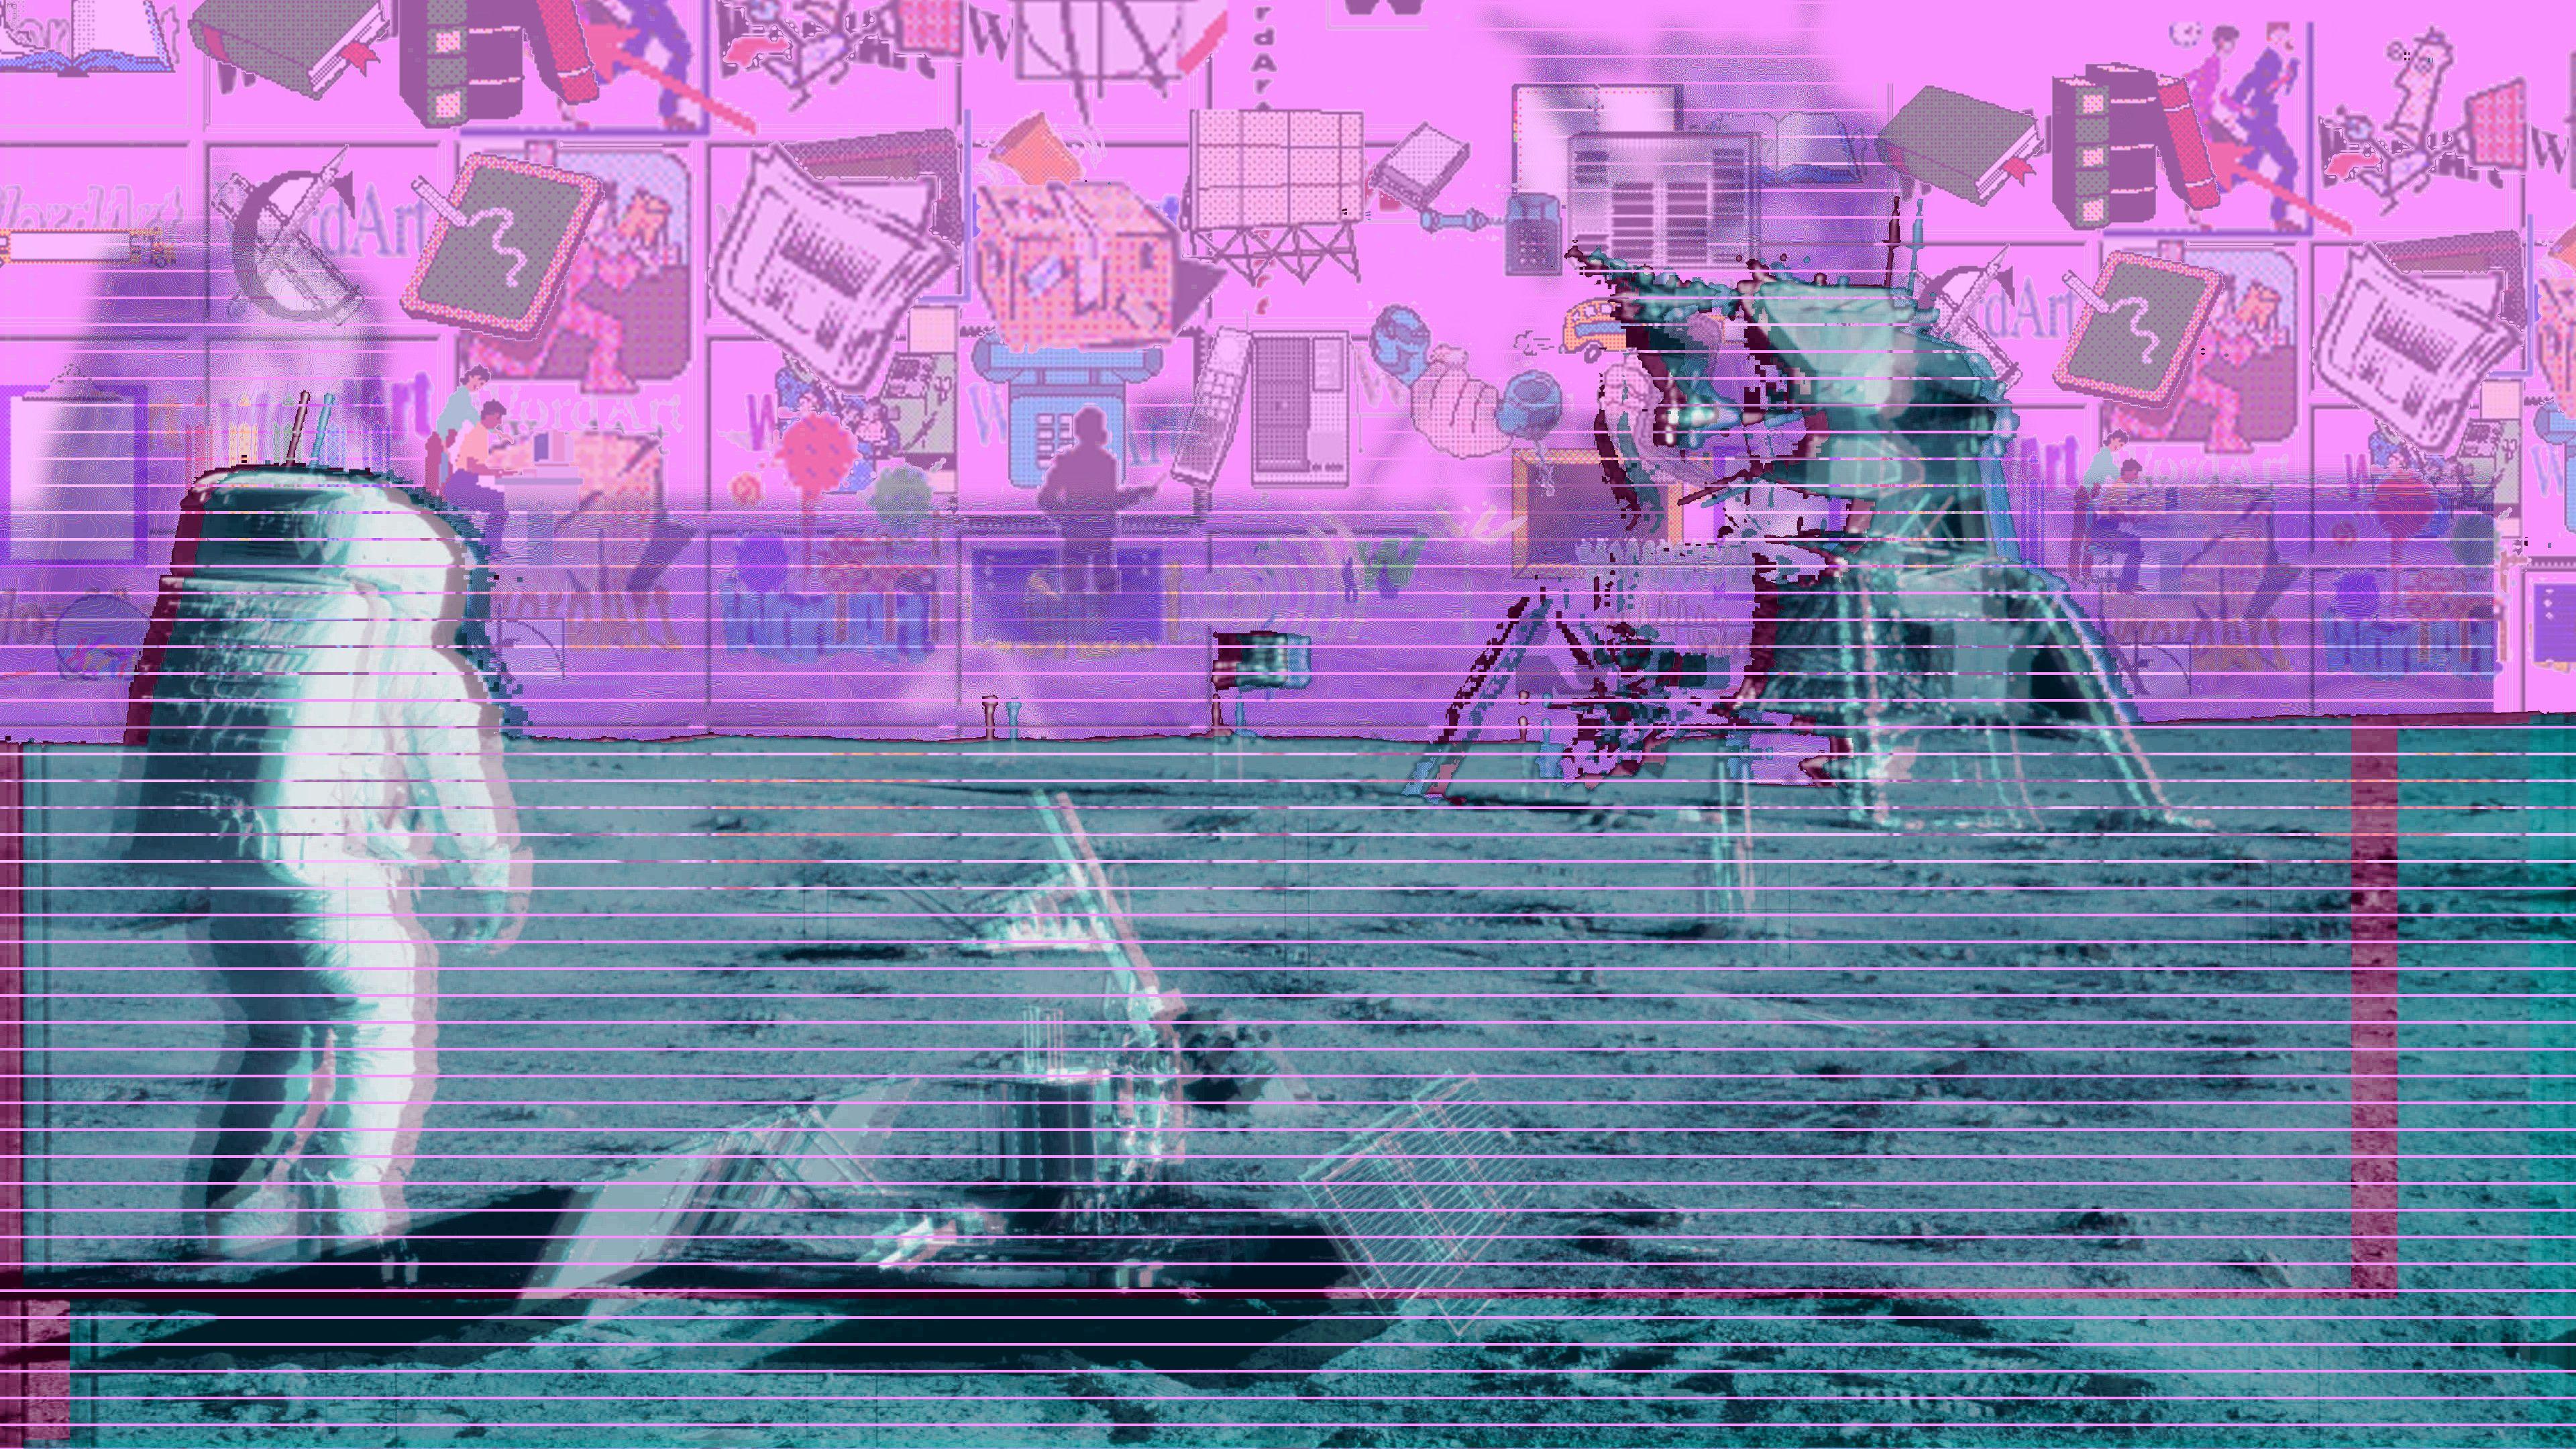 Vaporwave Wallpaper 2560x1600 ID57023 Papel de